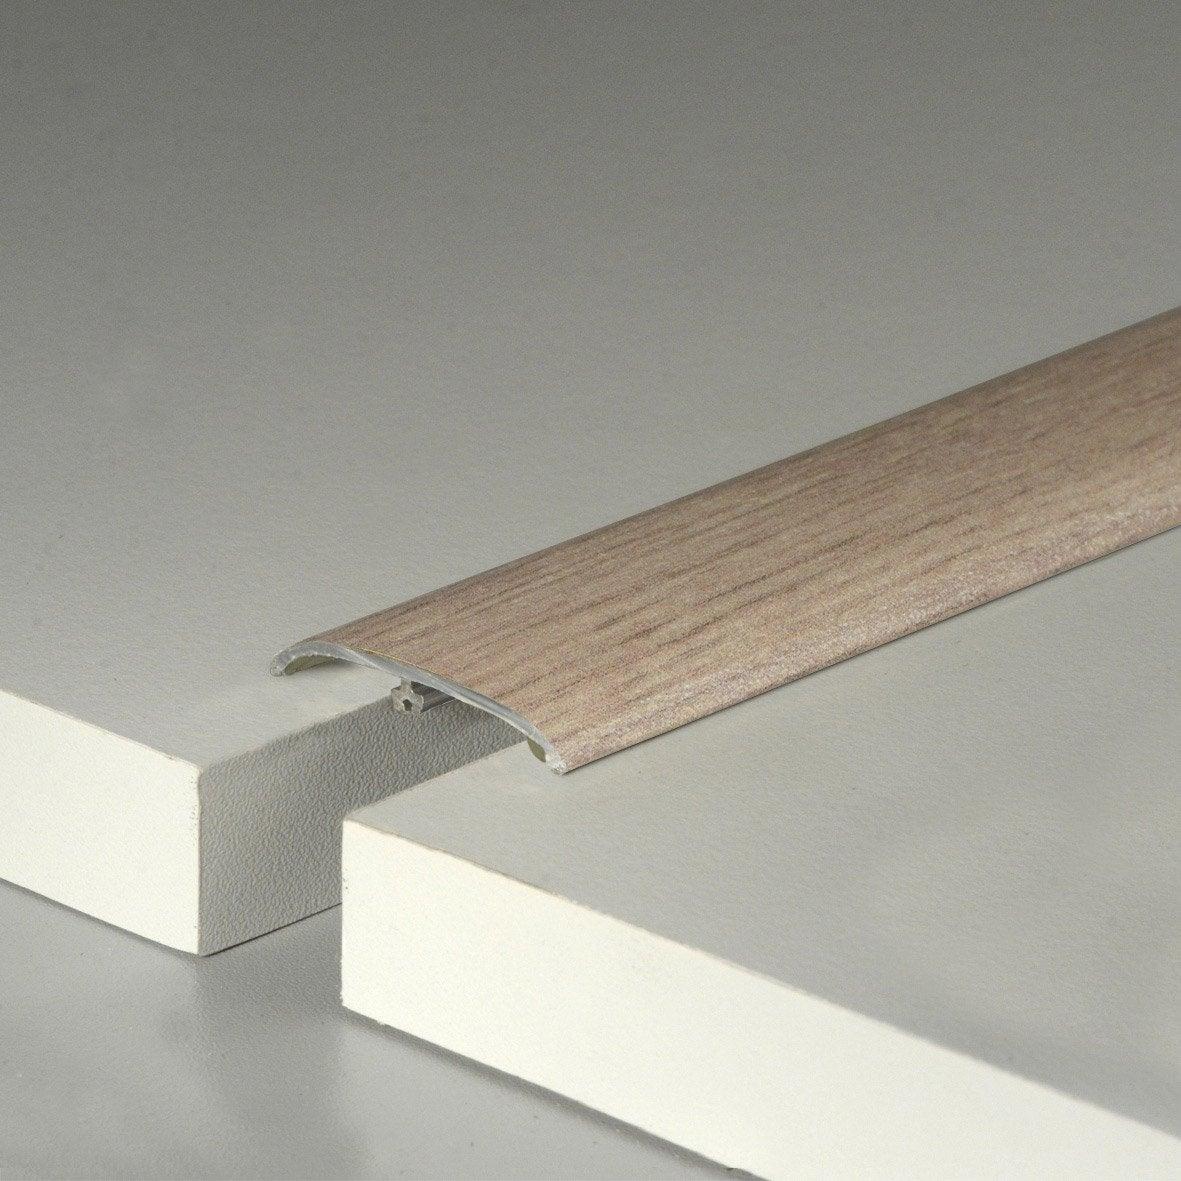 barre de seuil pour sol stratifi vicence cm x mm leroy merlin. Black Bedroom Furniture Sets. Home Design Ideas